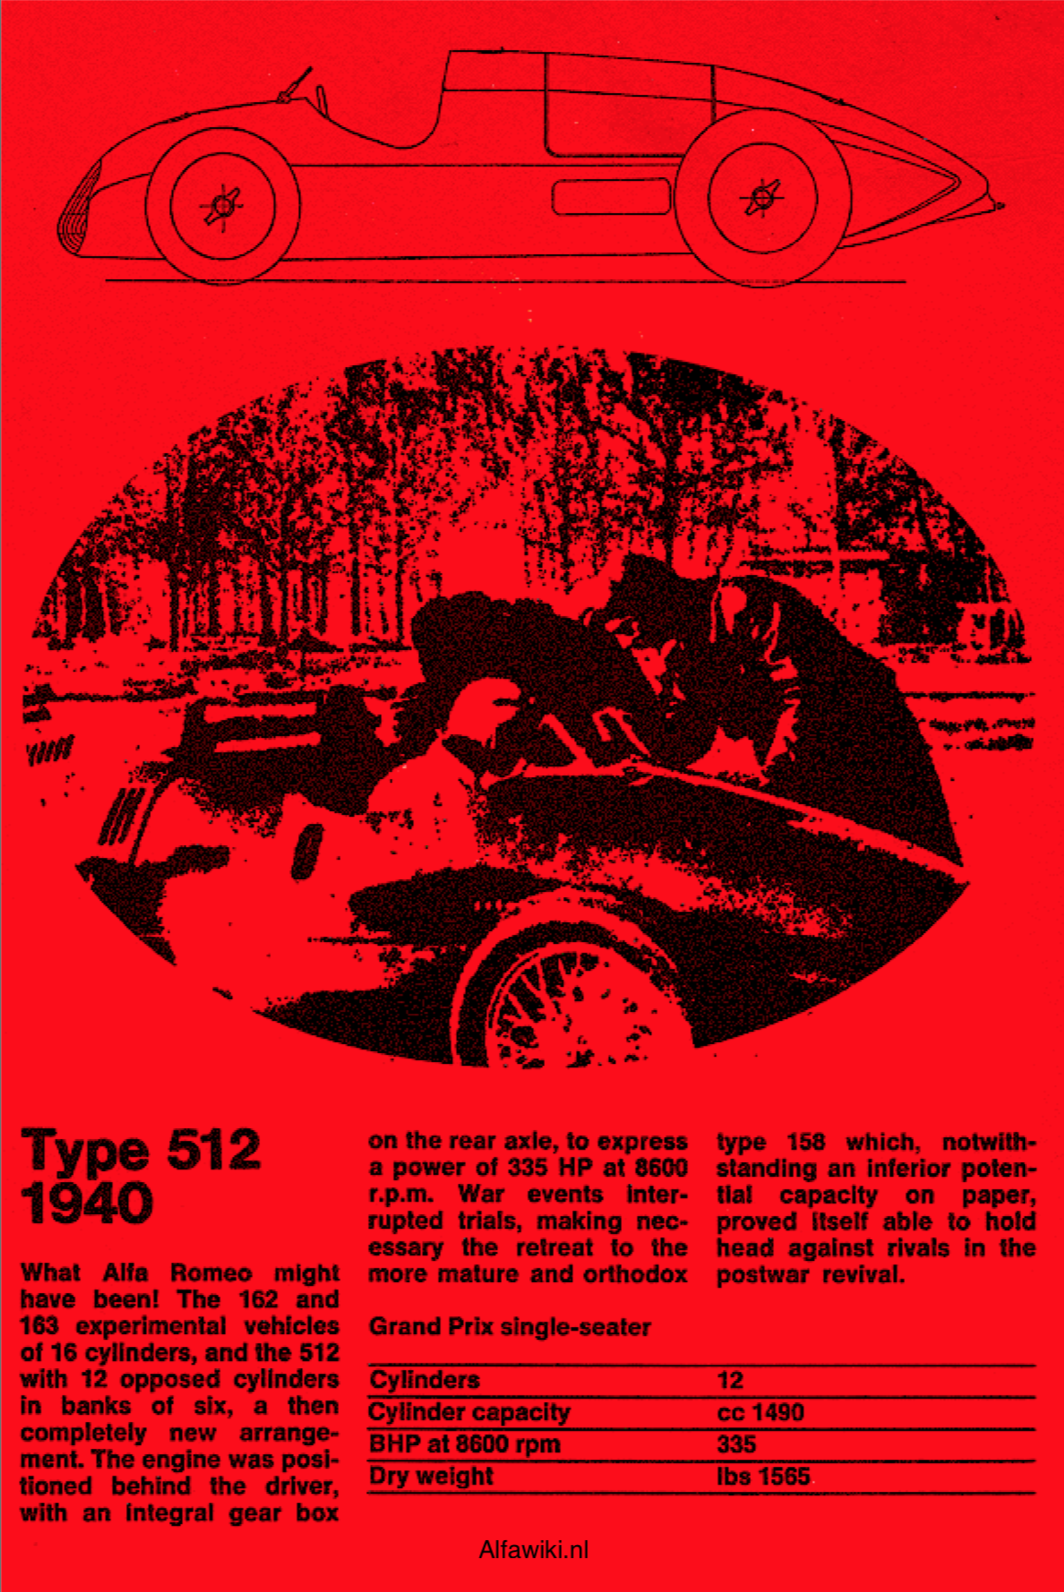 Alfa Romeo 512 flyer